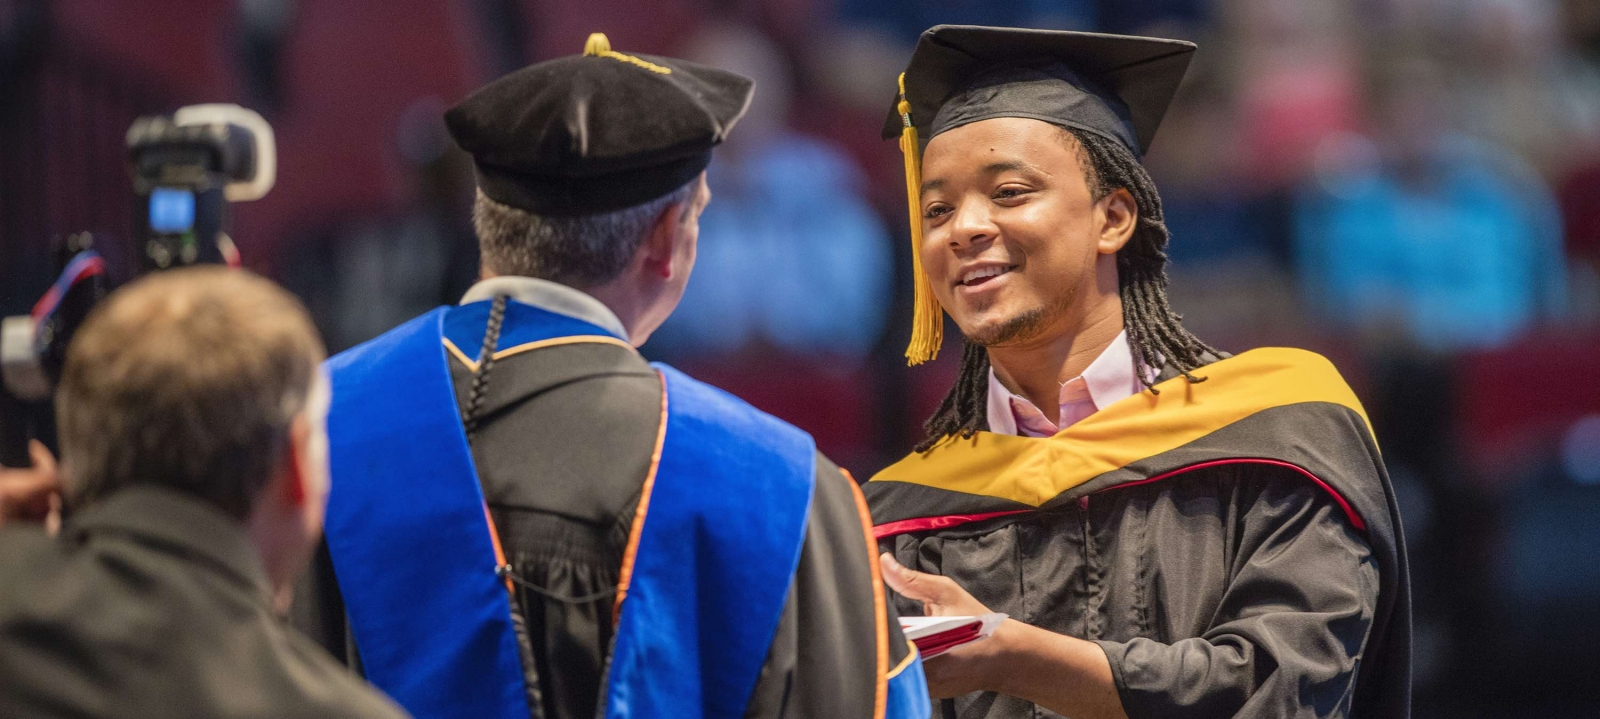 Student receiving diploma at graduation.